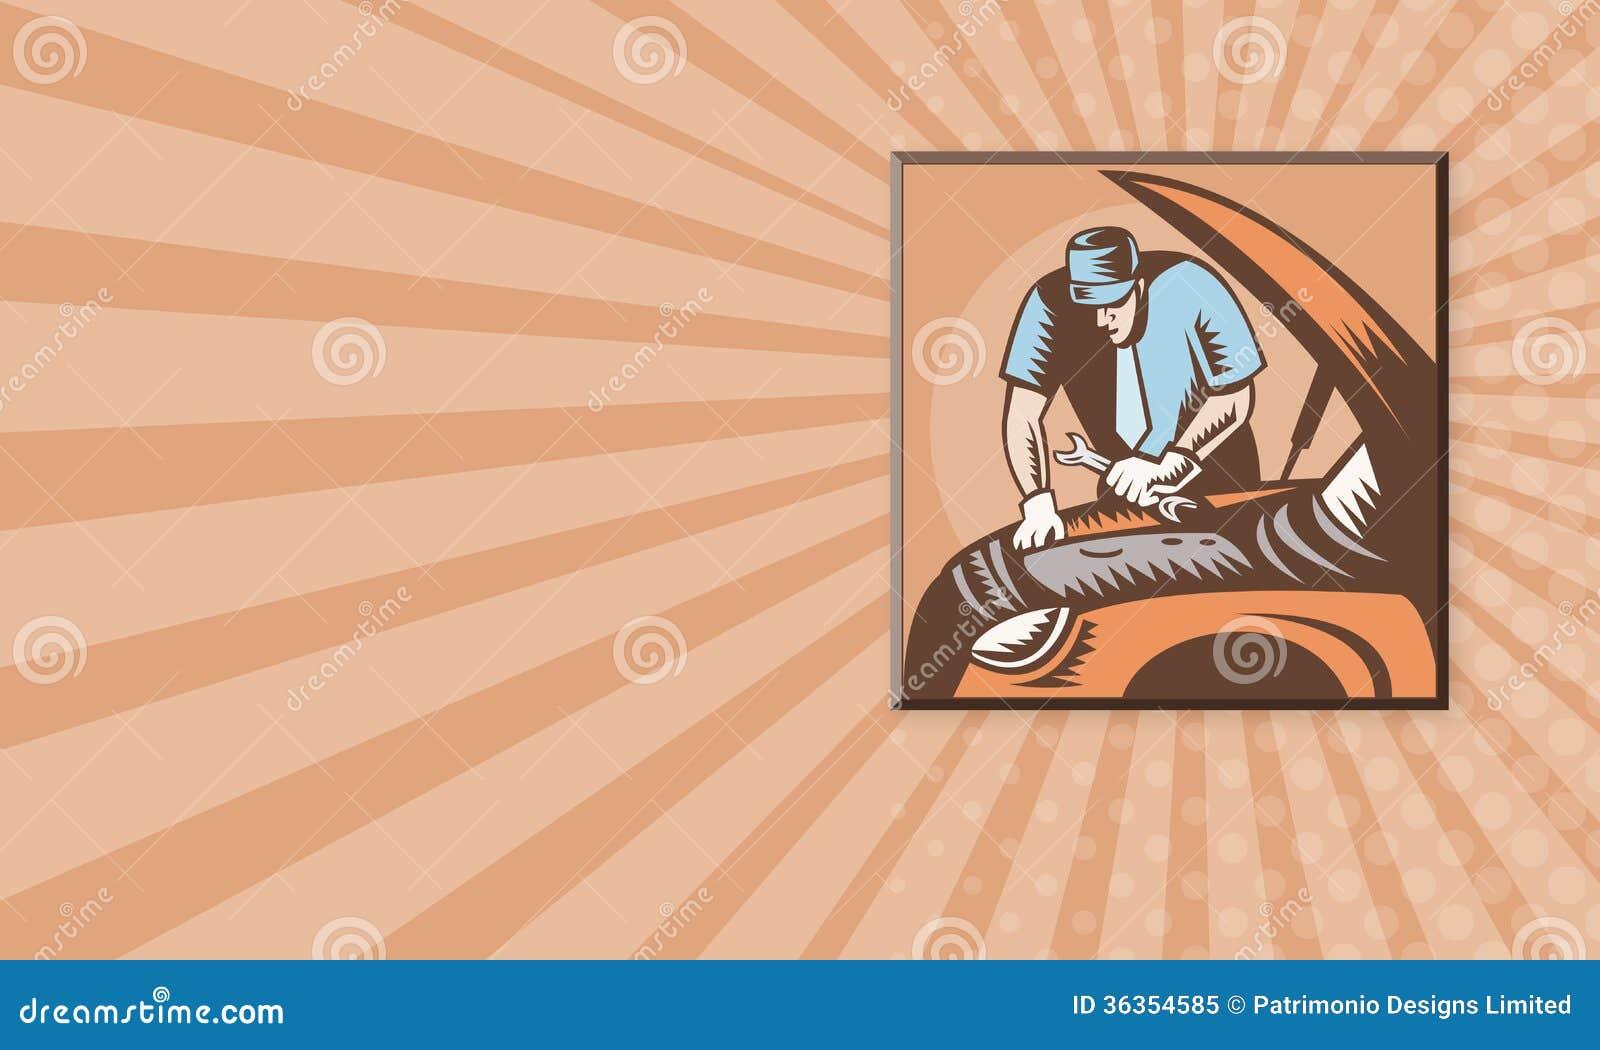 Automobile Mechanic Car Repair Stock Illustration - Image: 36354585